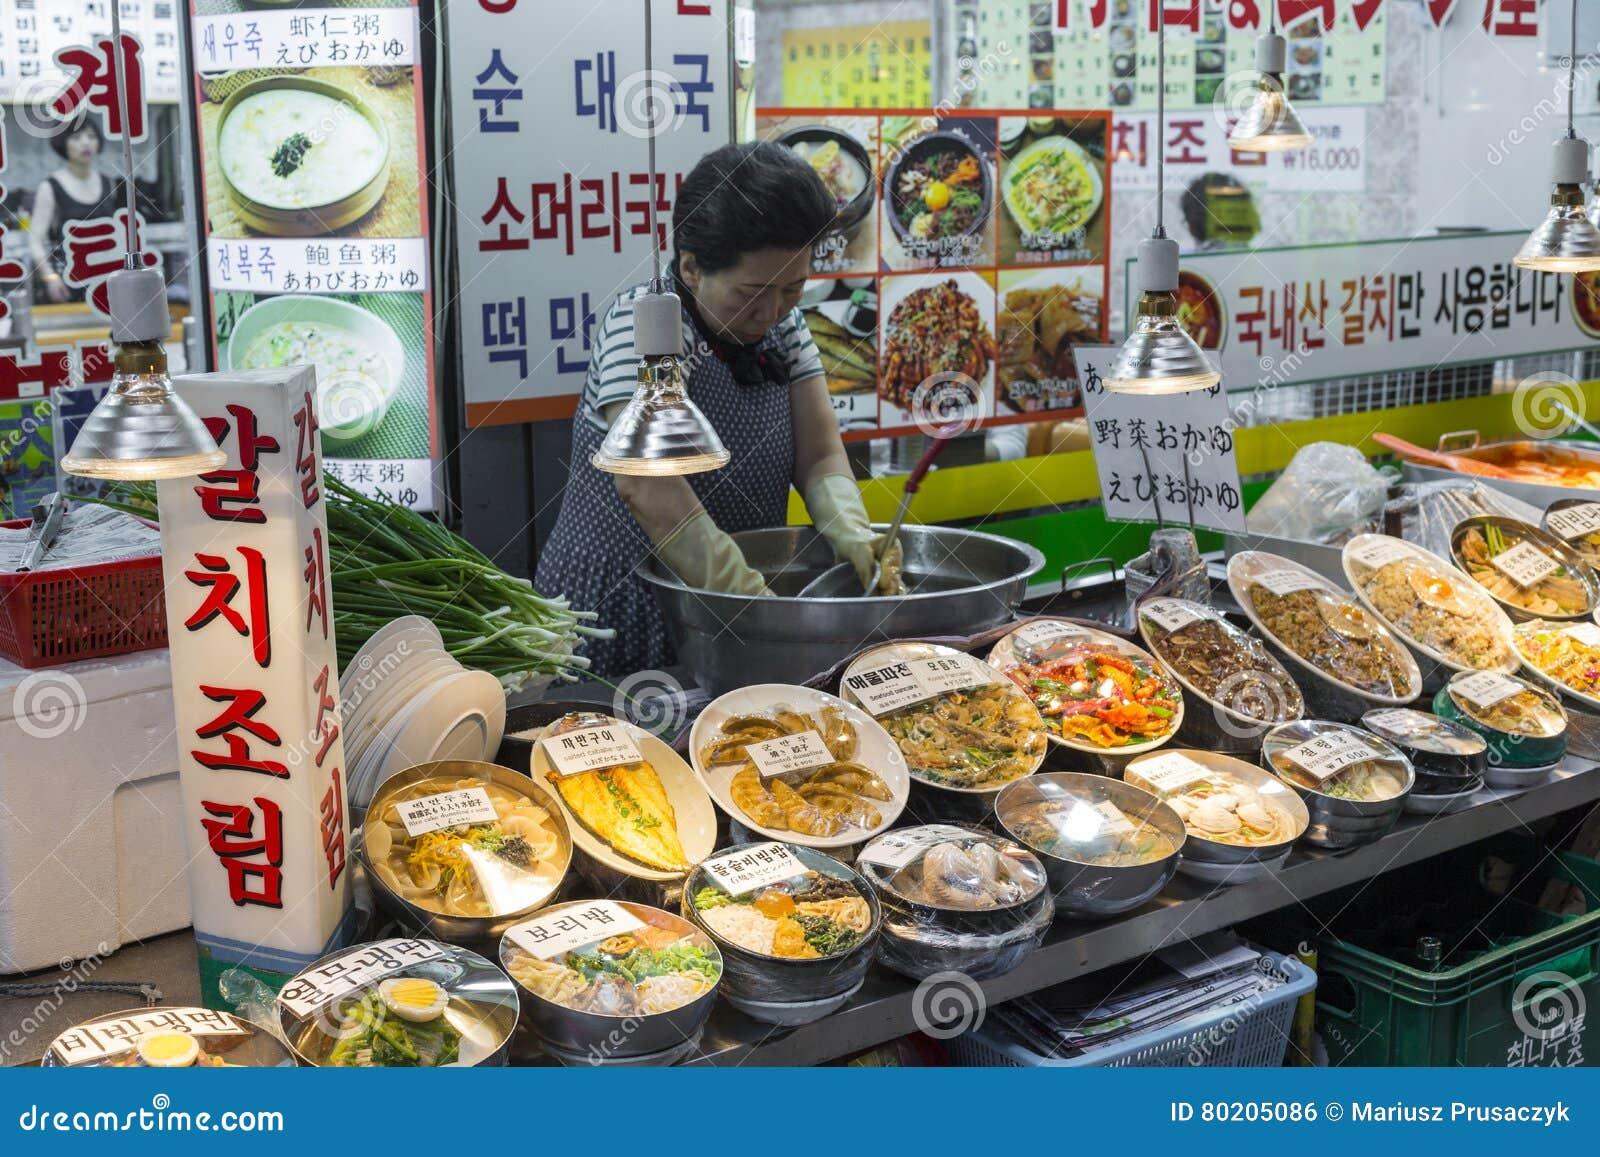 SEOUL - OCTOBER 21, 2016: Traditional food market in Seoul, Korea.